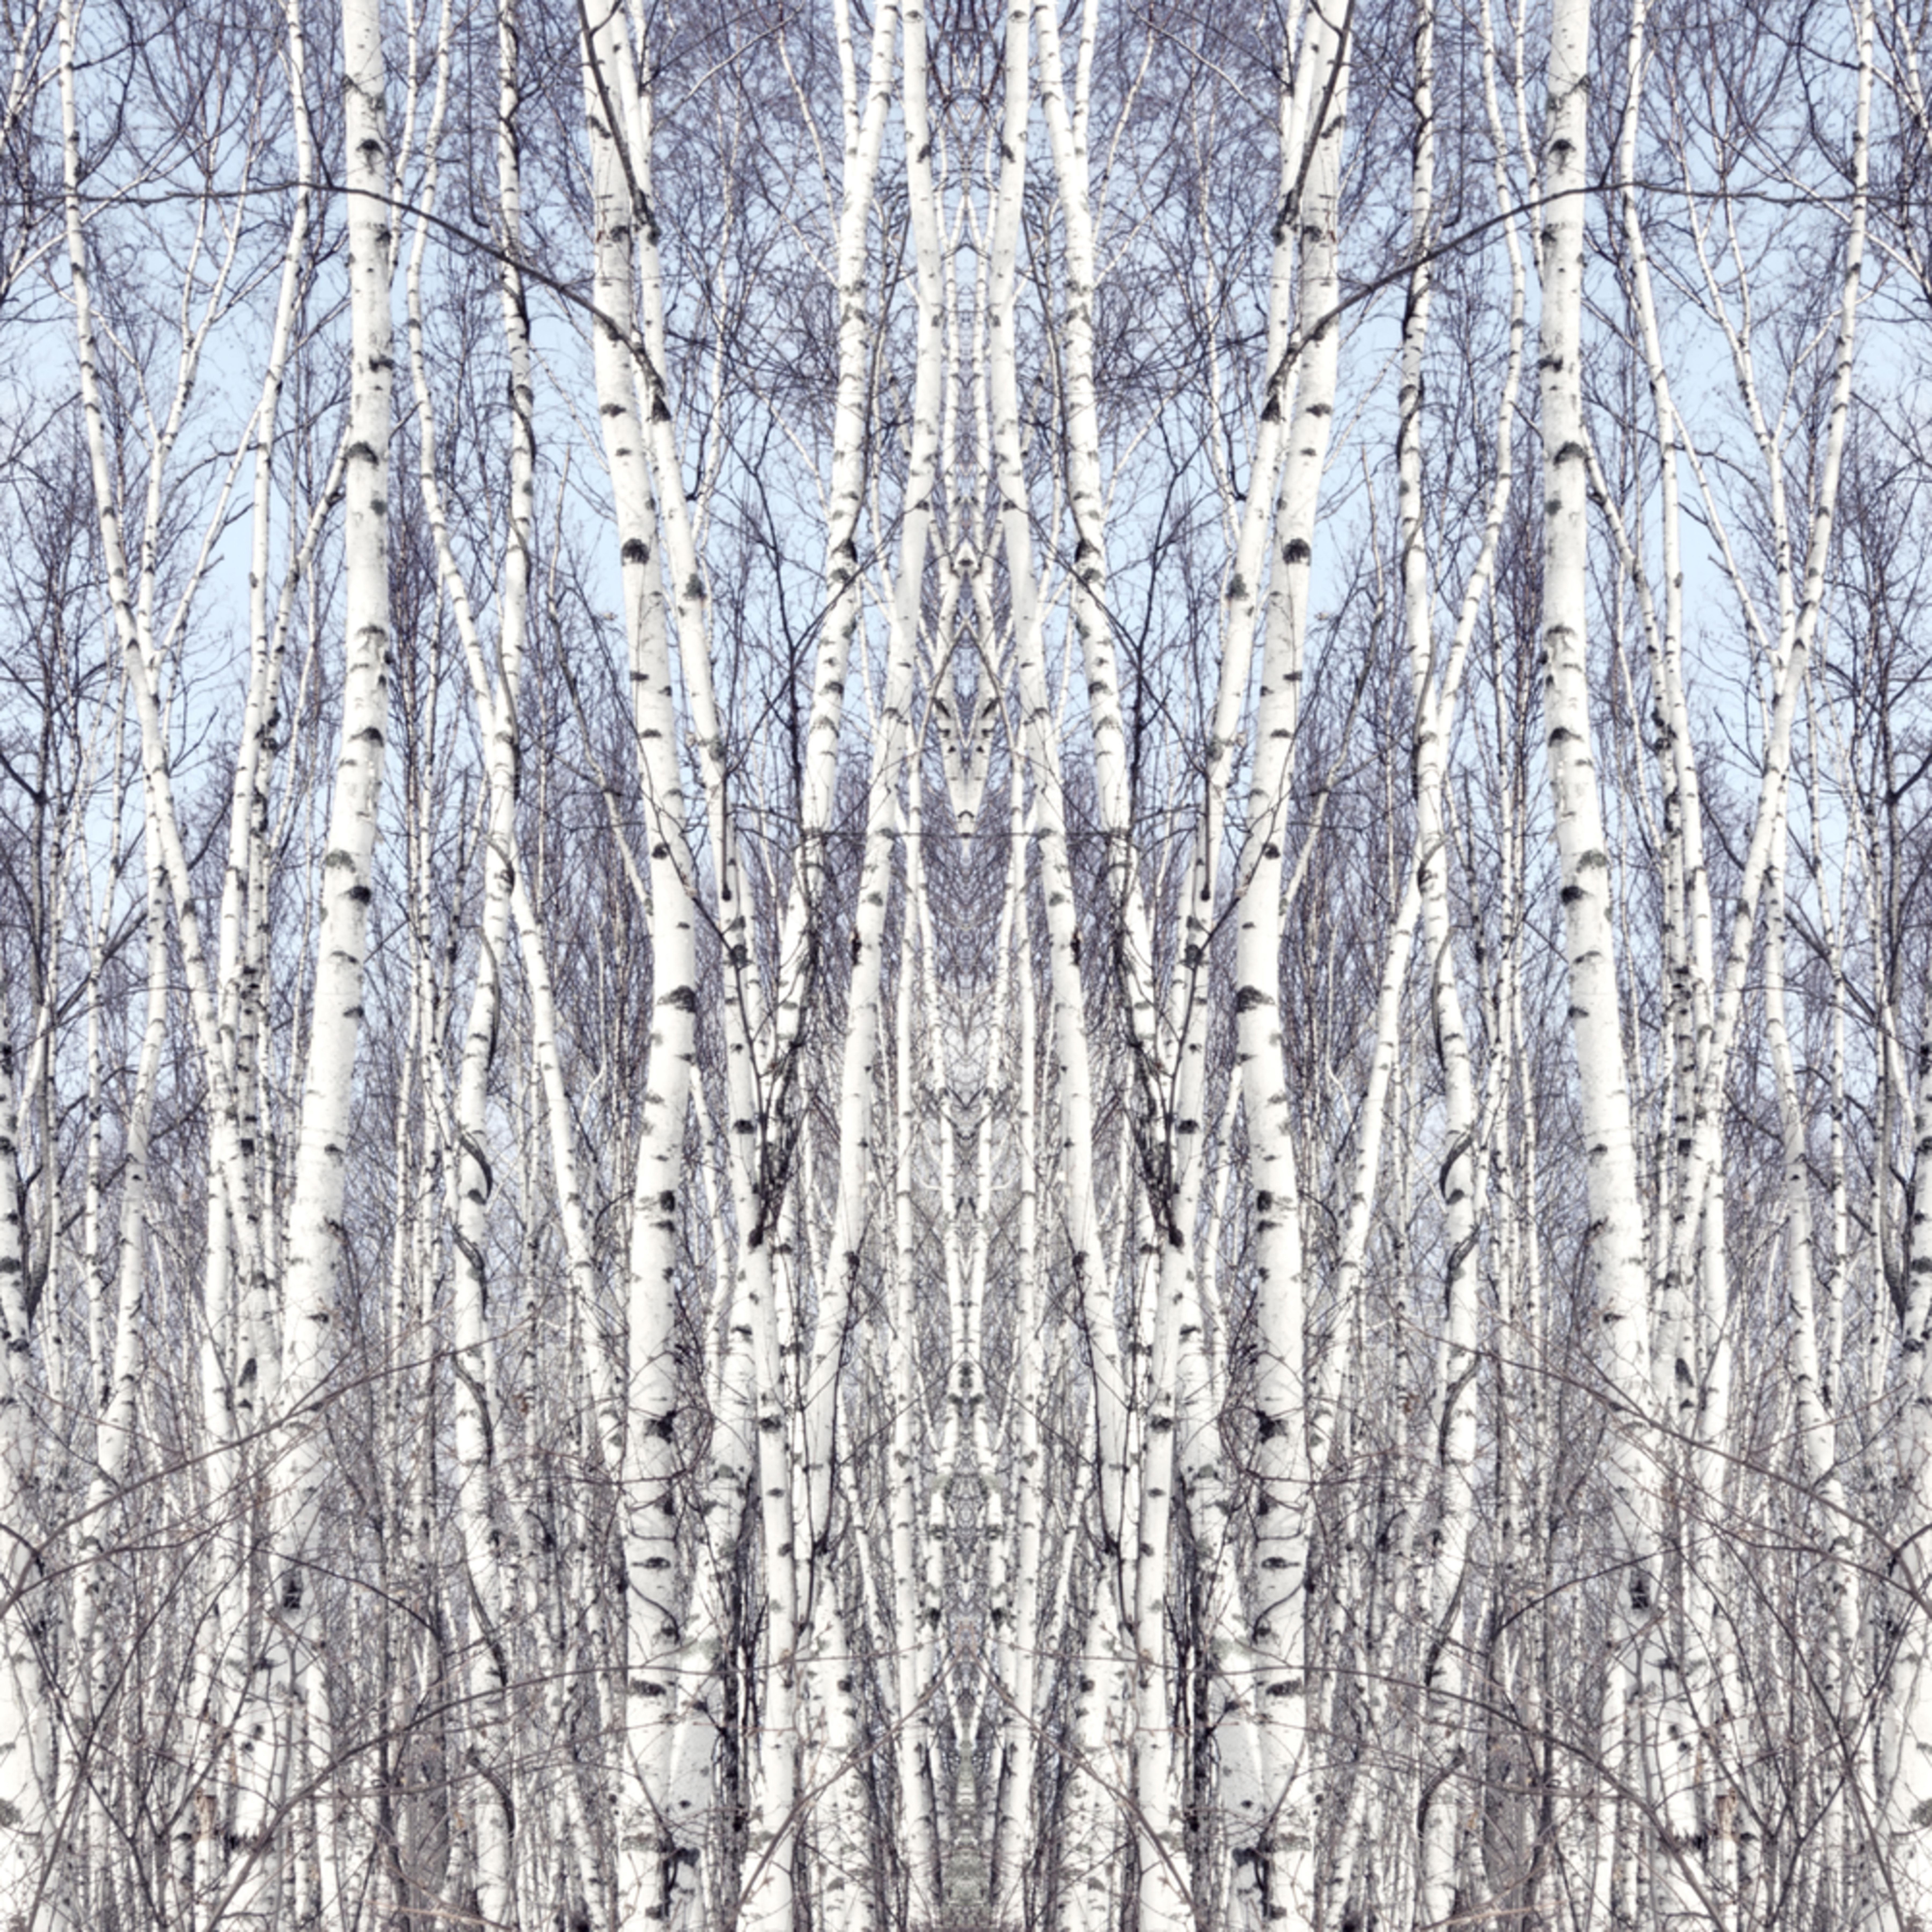 Birch  3 asf  johzlv